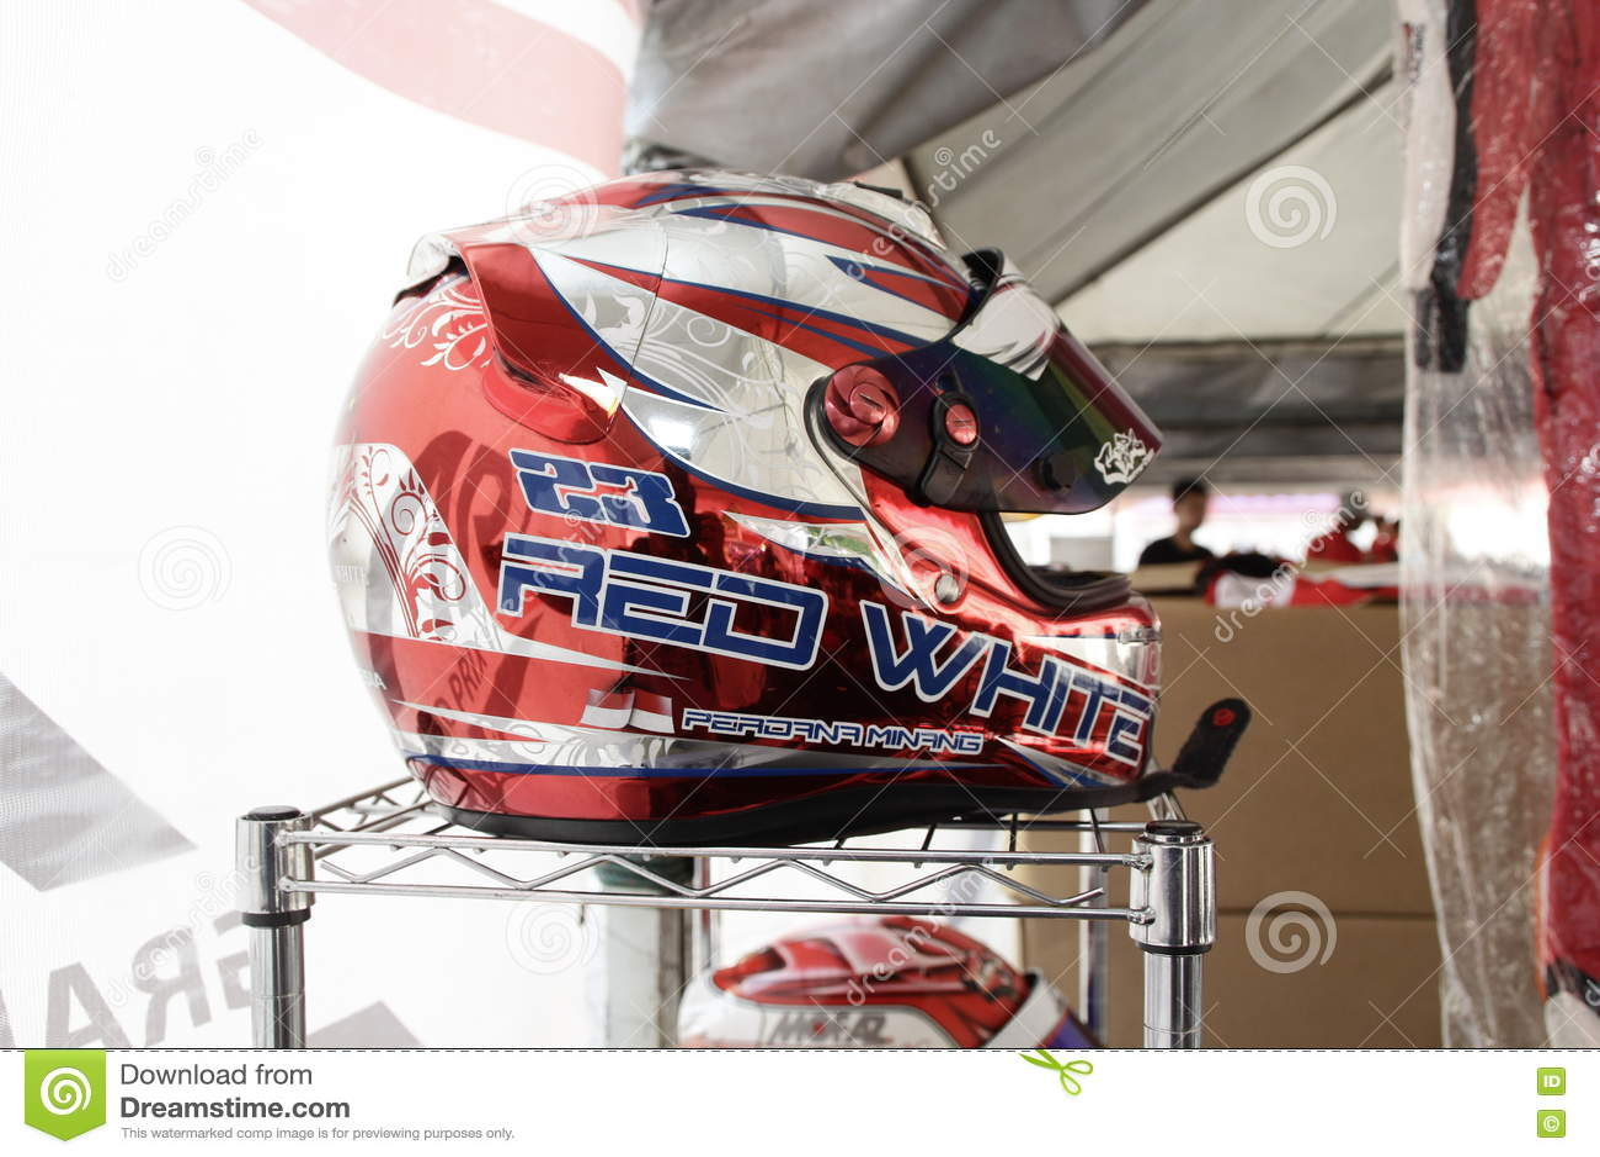 Go kart racing sports editorial stock image  Image of kart - 72565549